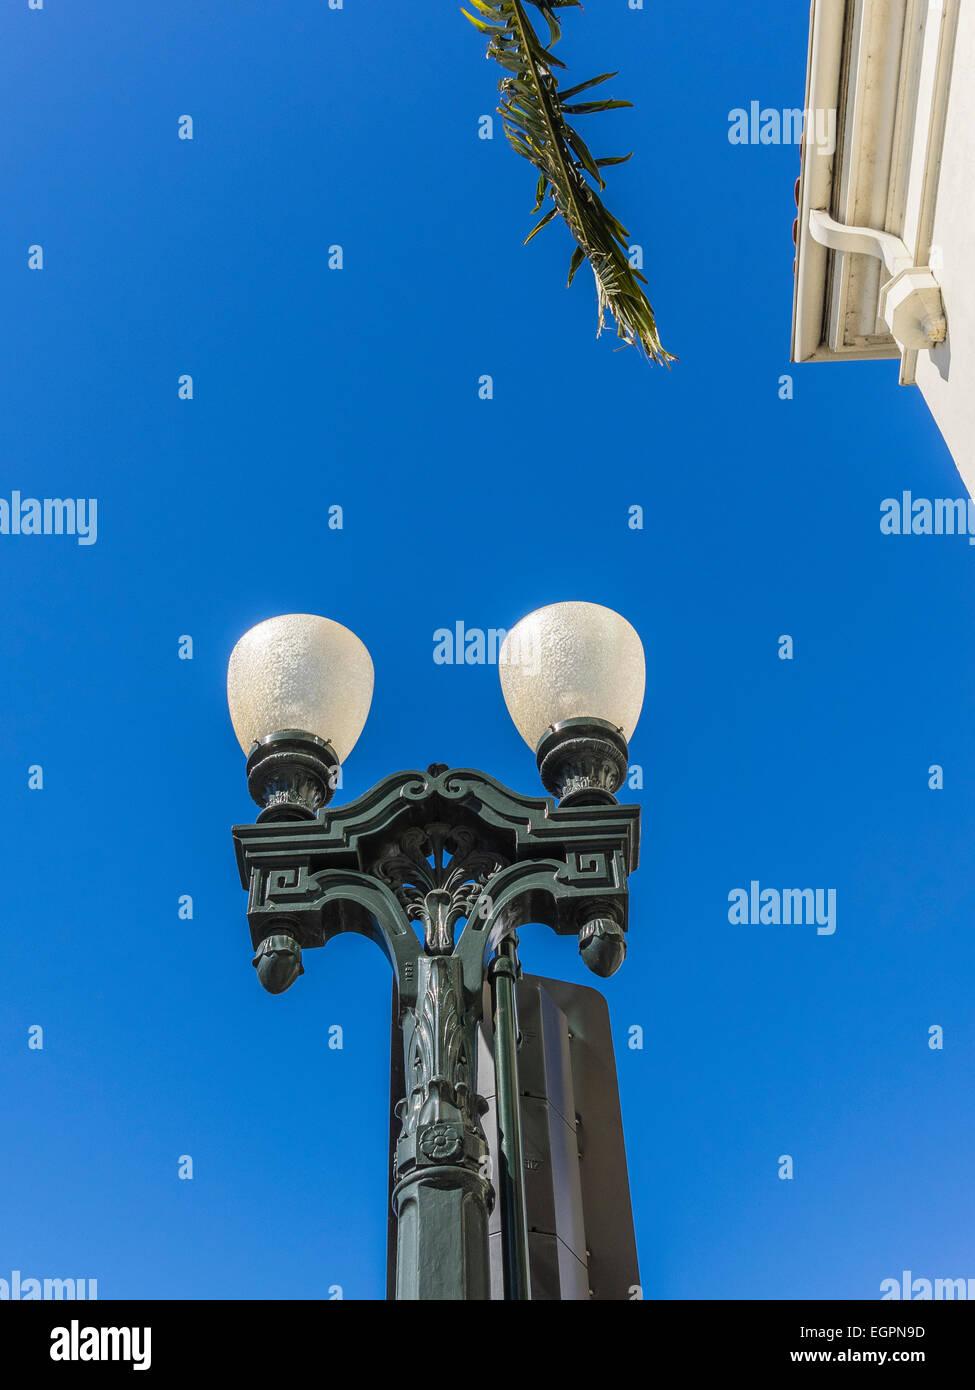 Classic decorative lamp post in Santa Barbara, California. - Stock Image